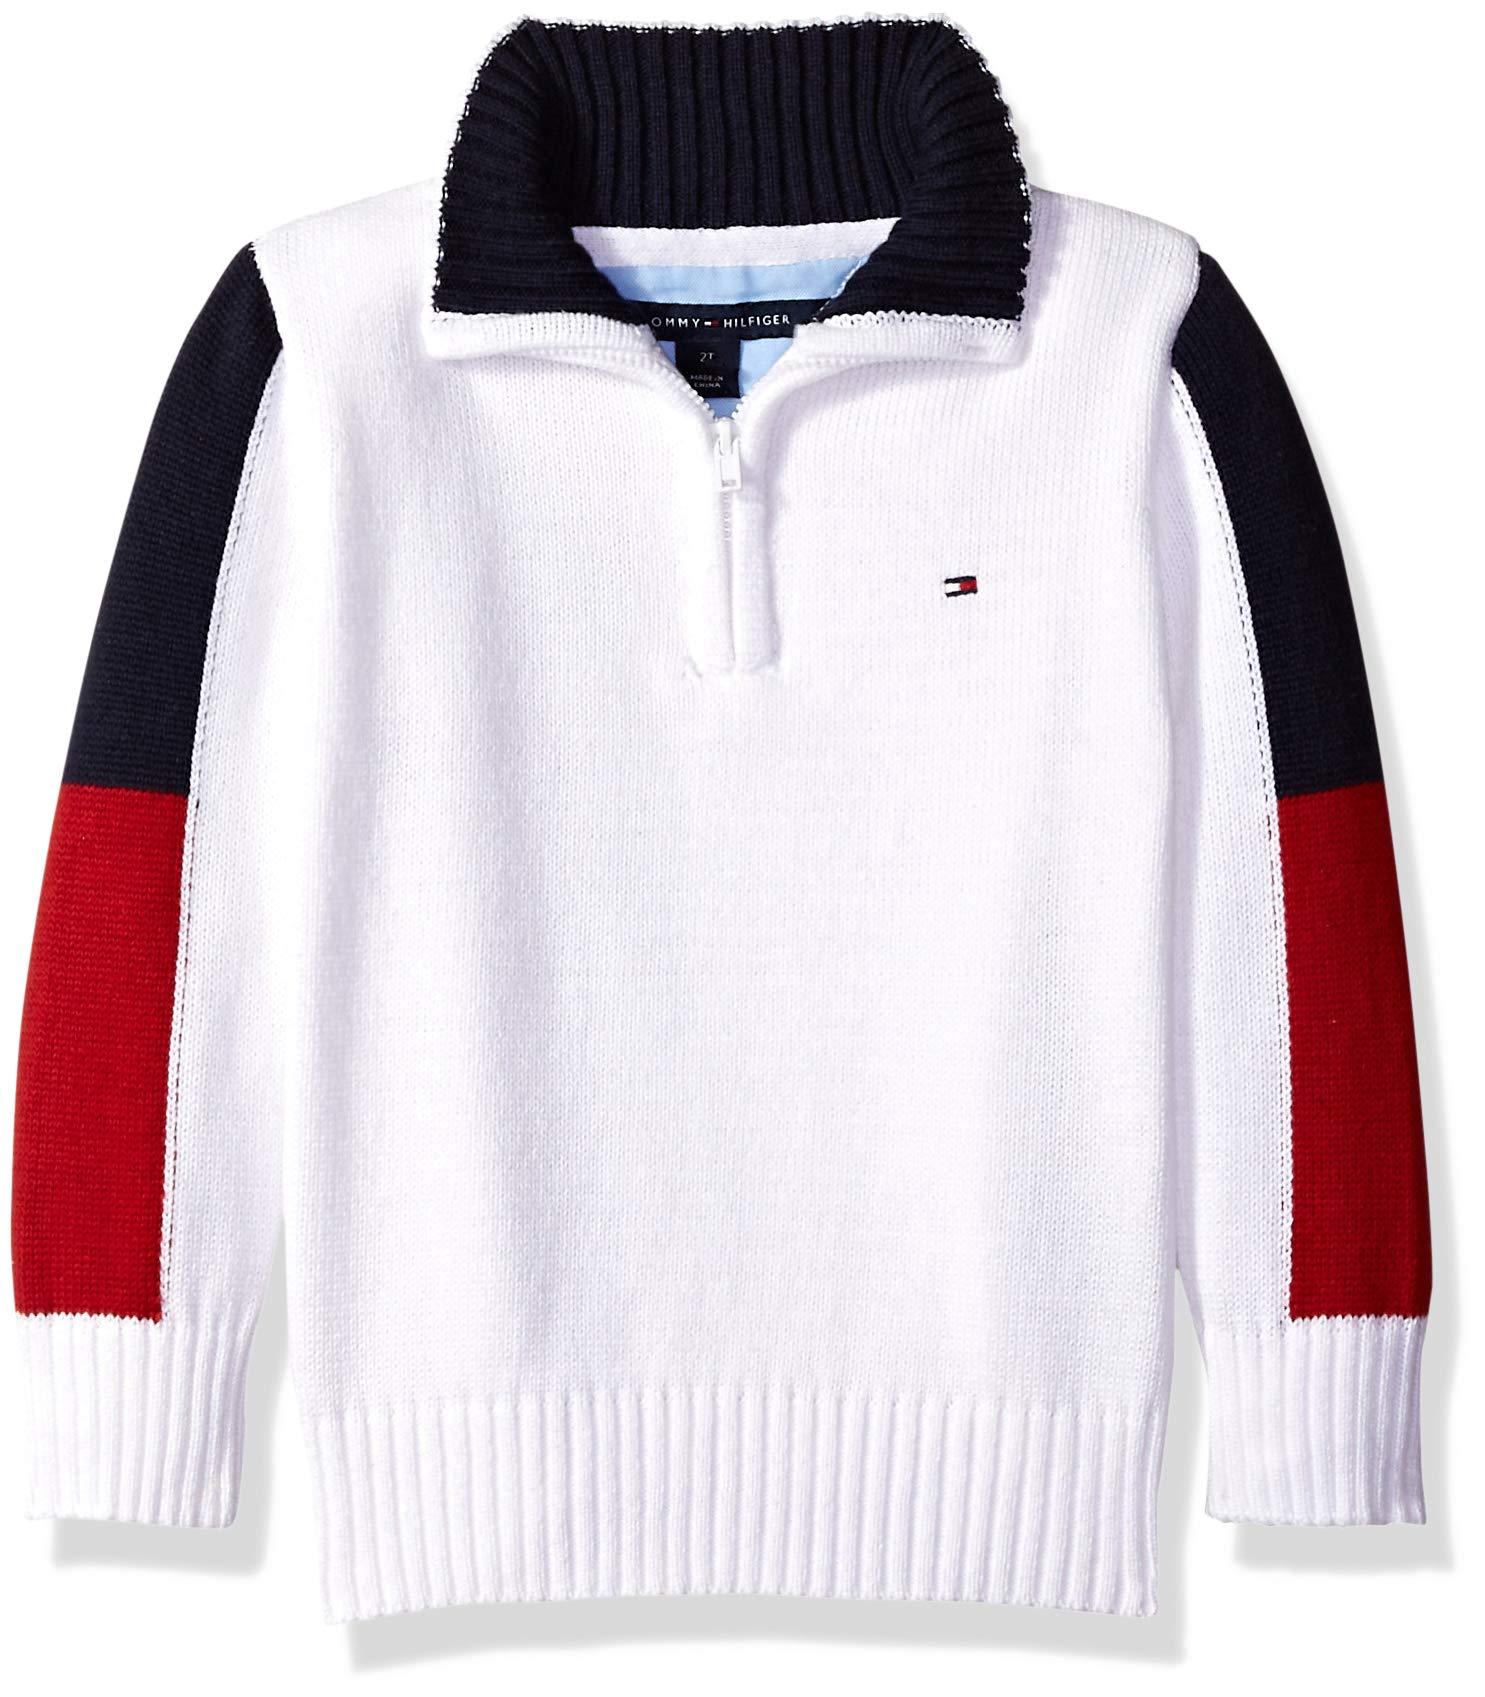 Tommy Hilfiger Toddler Boys' Long Sleeve Half Zip Pullover Sweater, Eddie Snow White, 4T